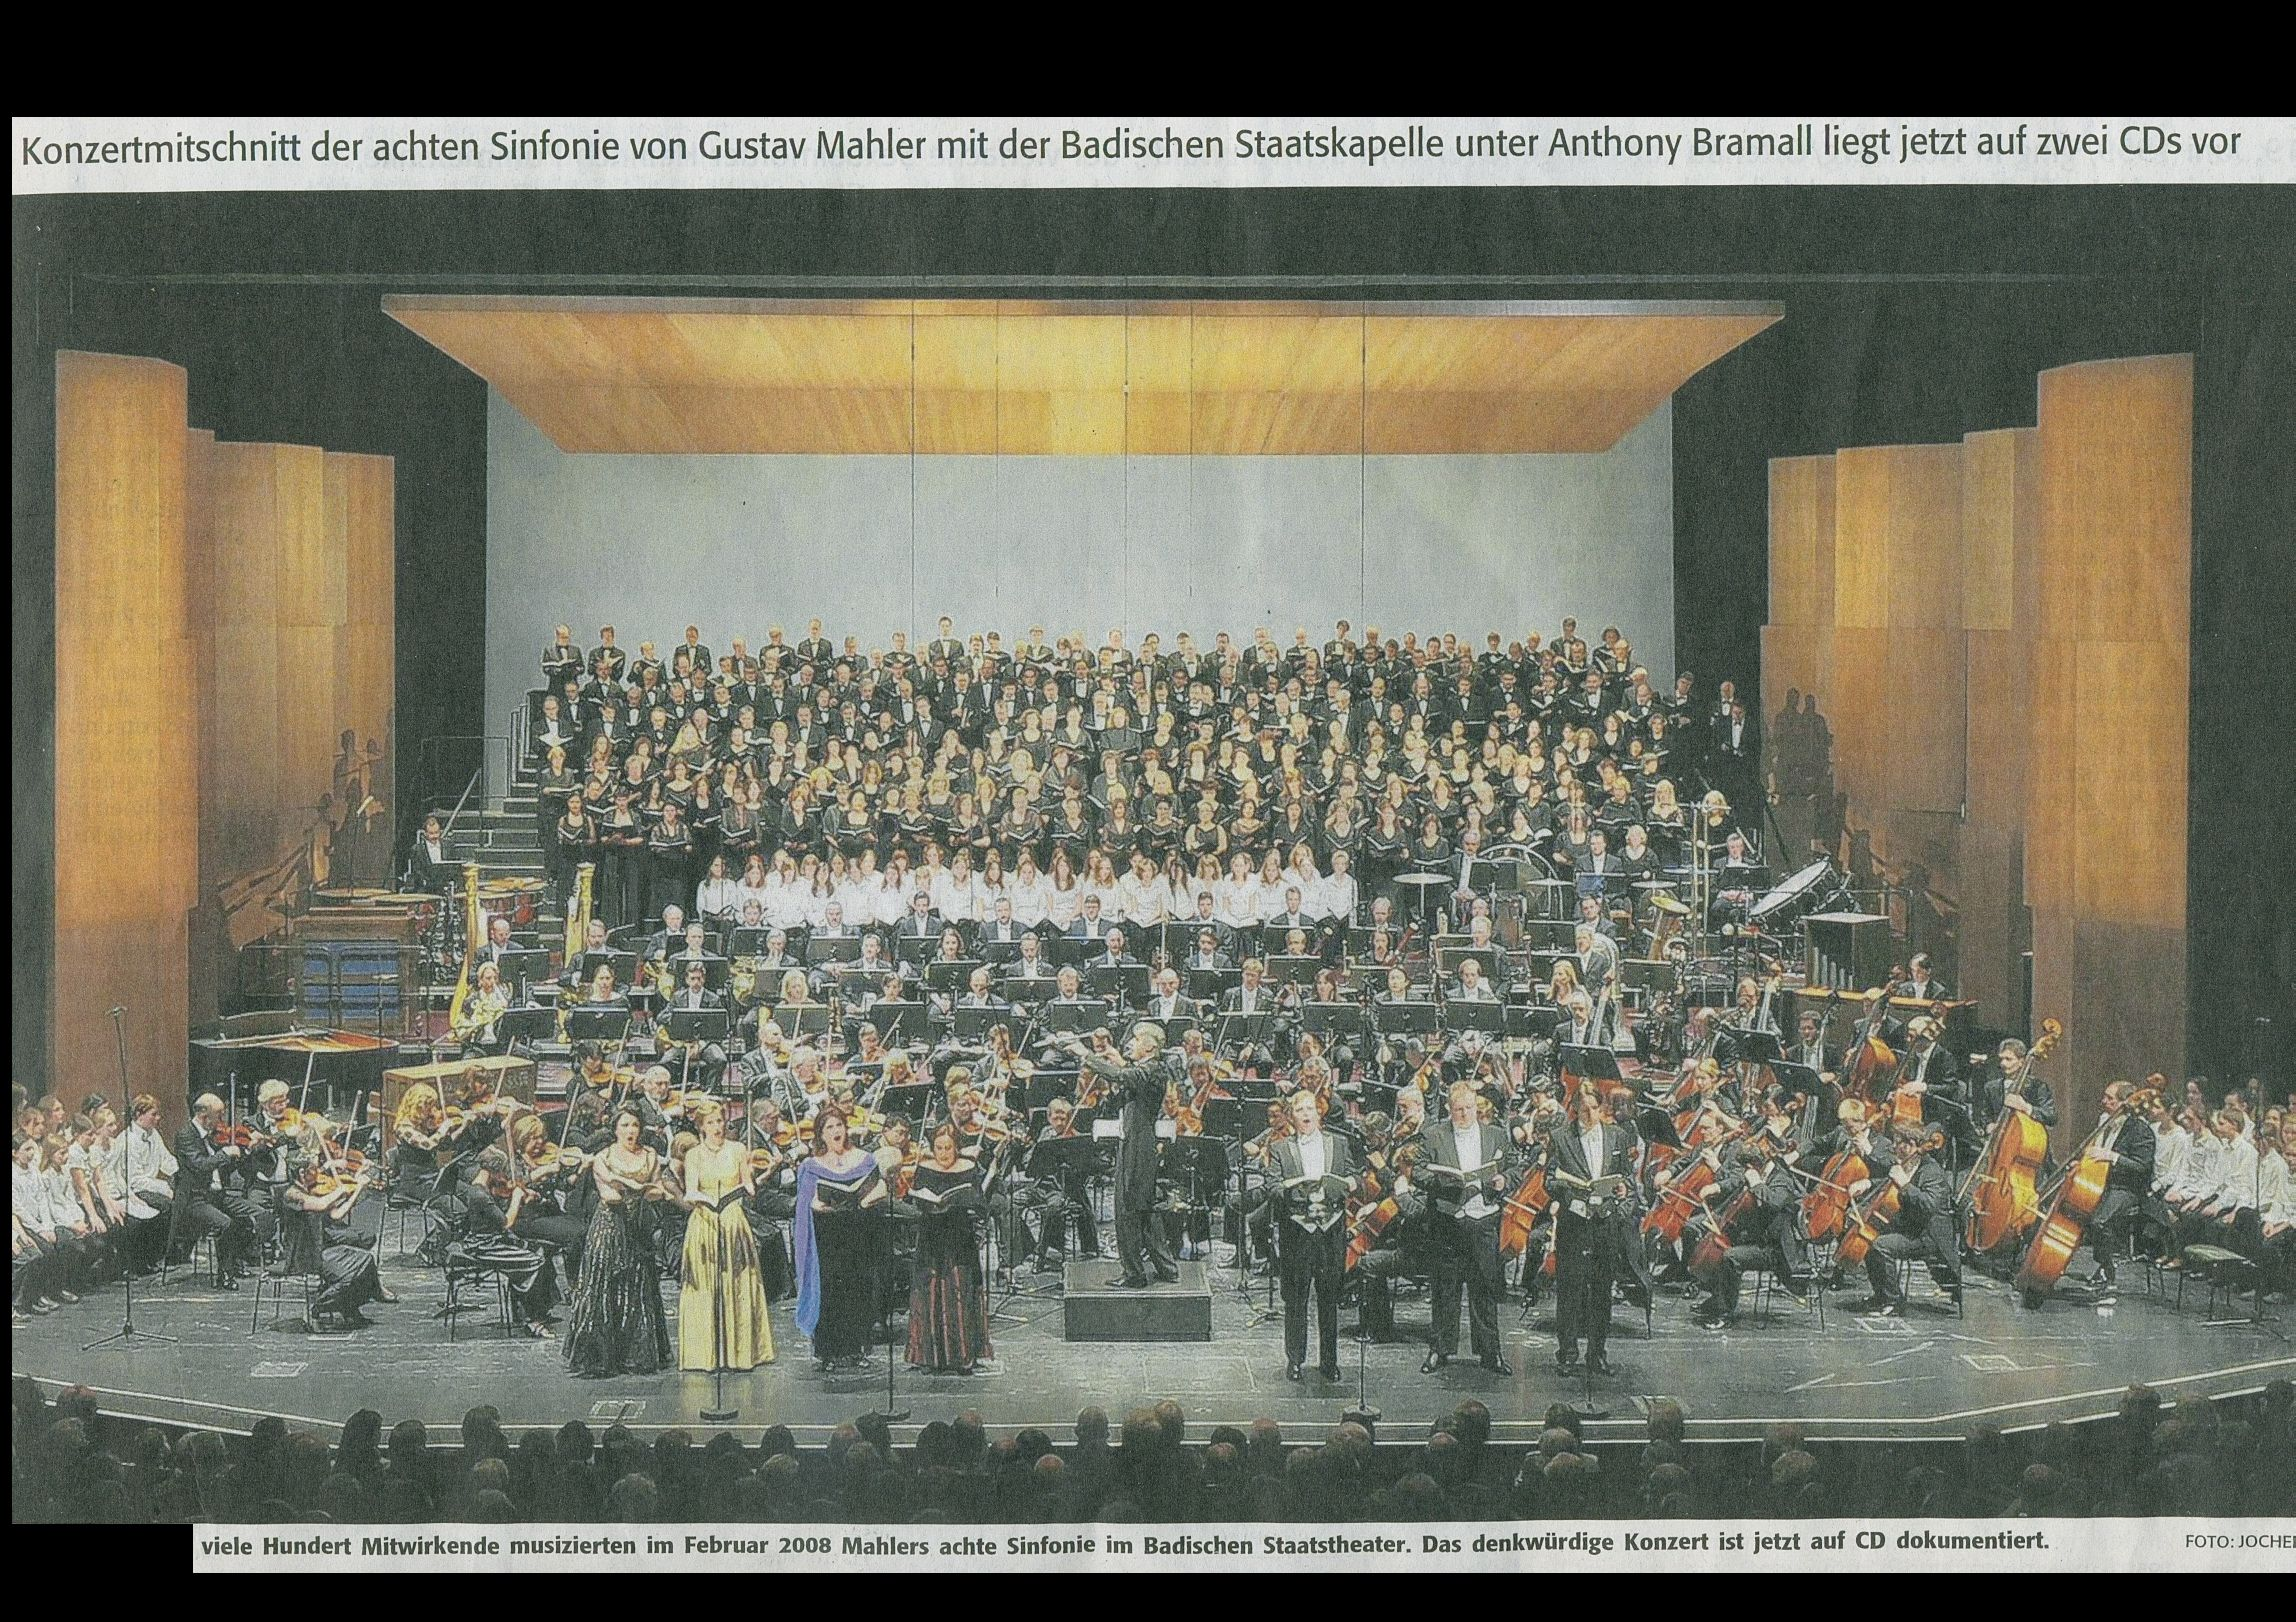 MahlersAchteKonzertbildFebruar2008